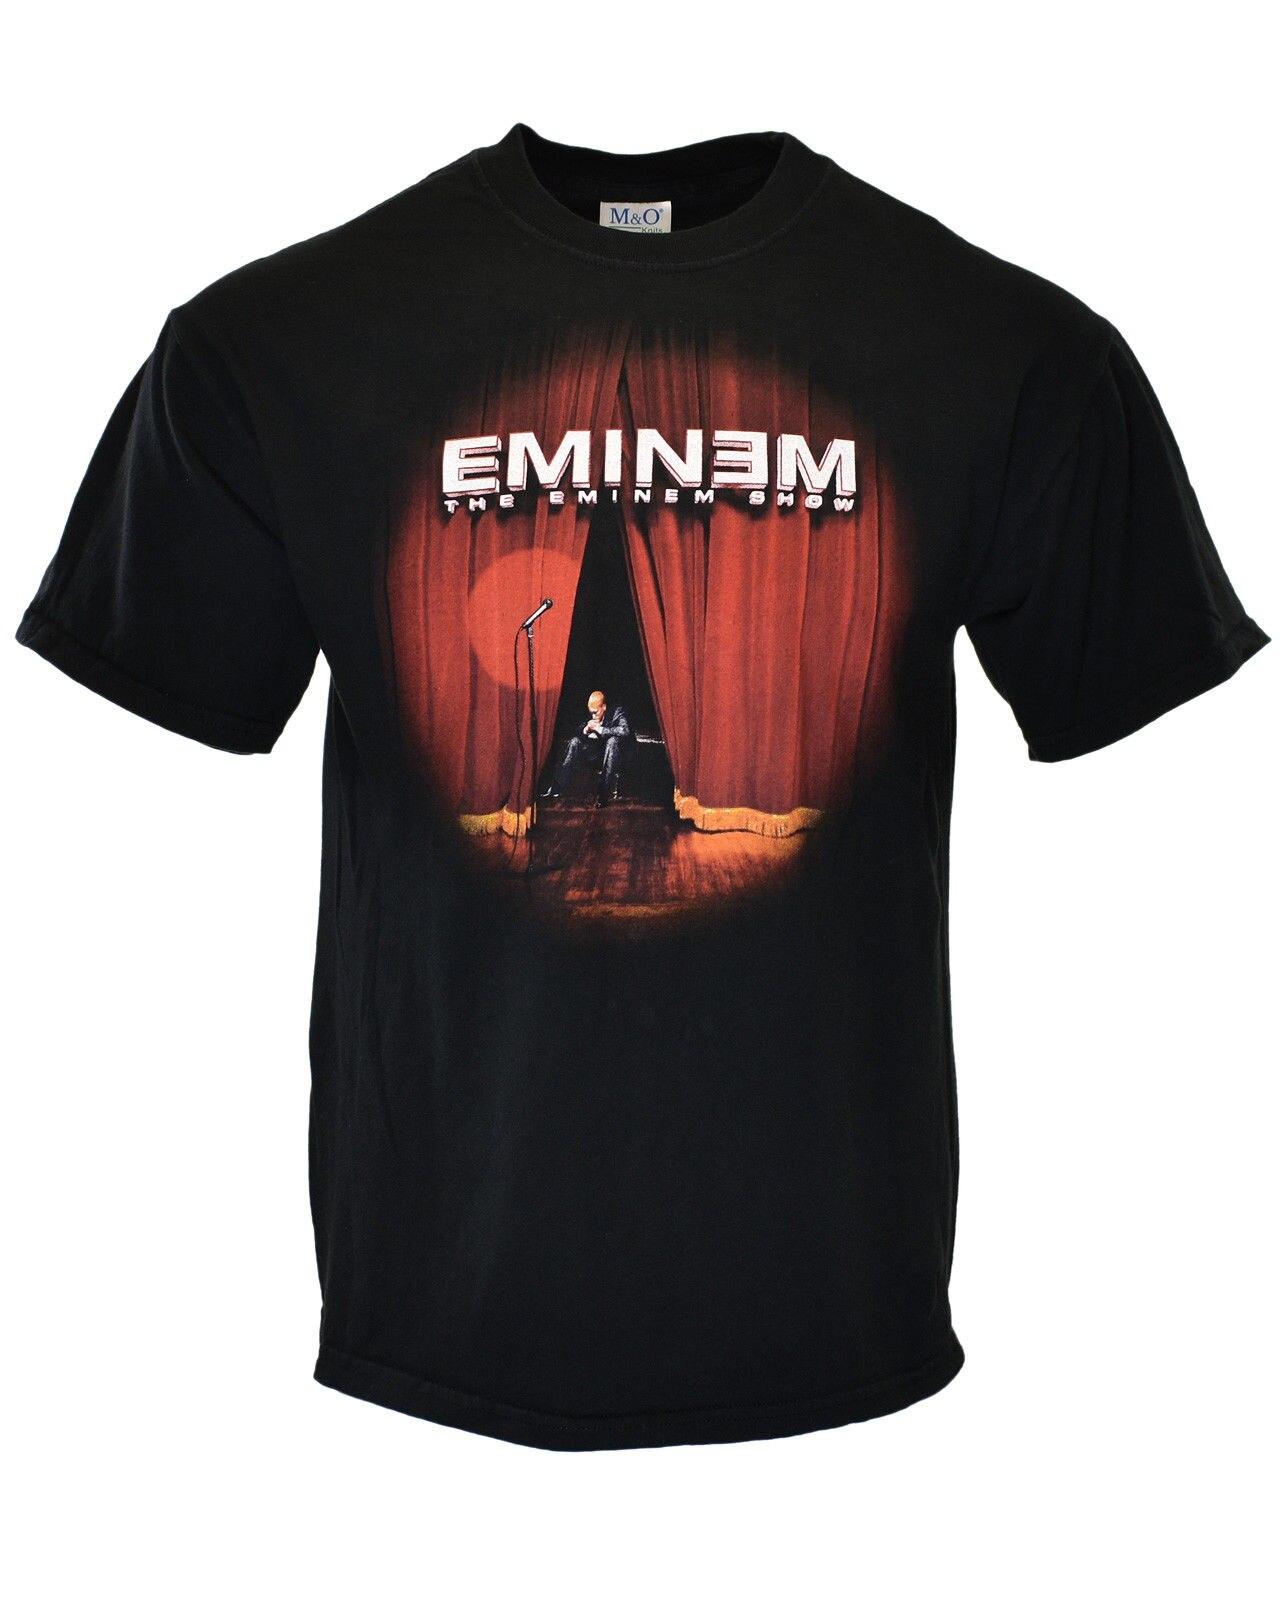 JANIS JOPLIN Band Vtg Rare 90s Rock Tour Punk Metal Concert T-Shirt Reprint New